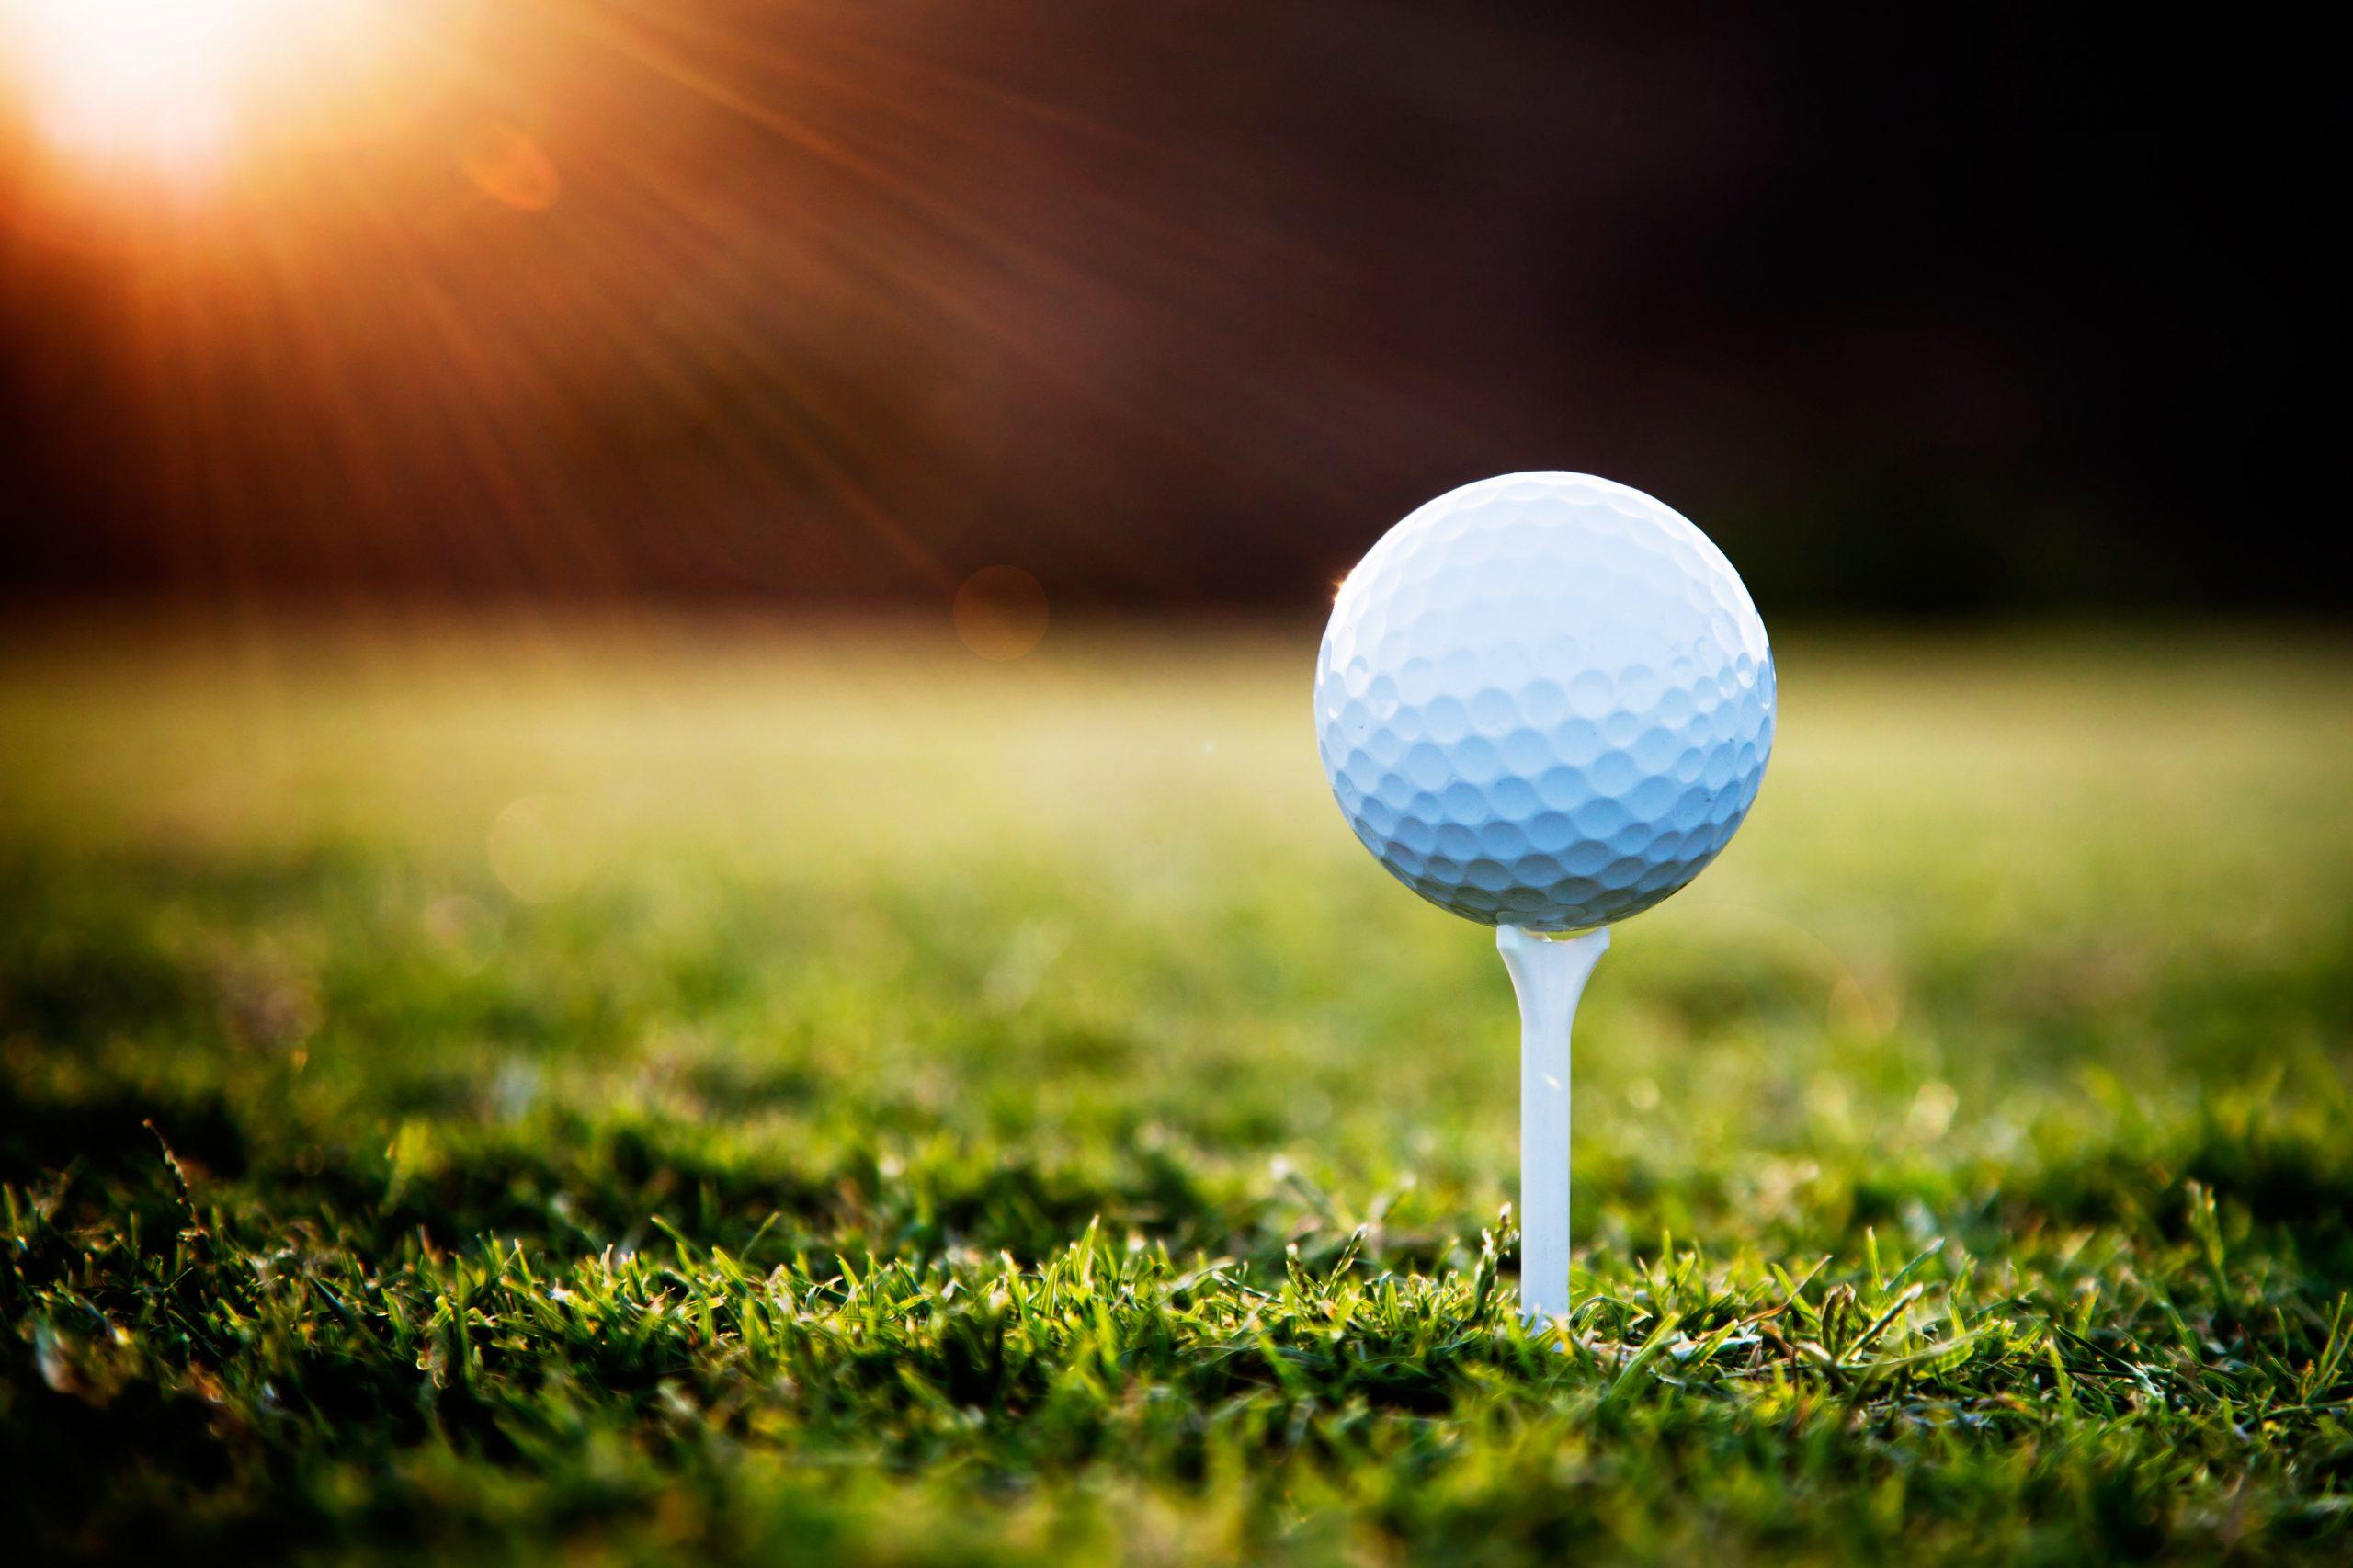 A golf ball on a golf tee